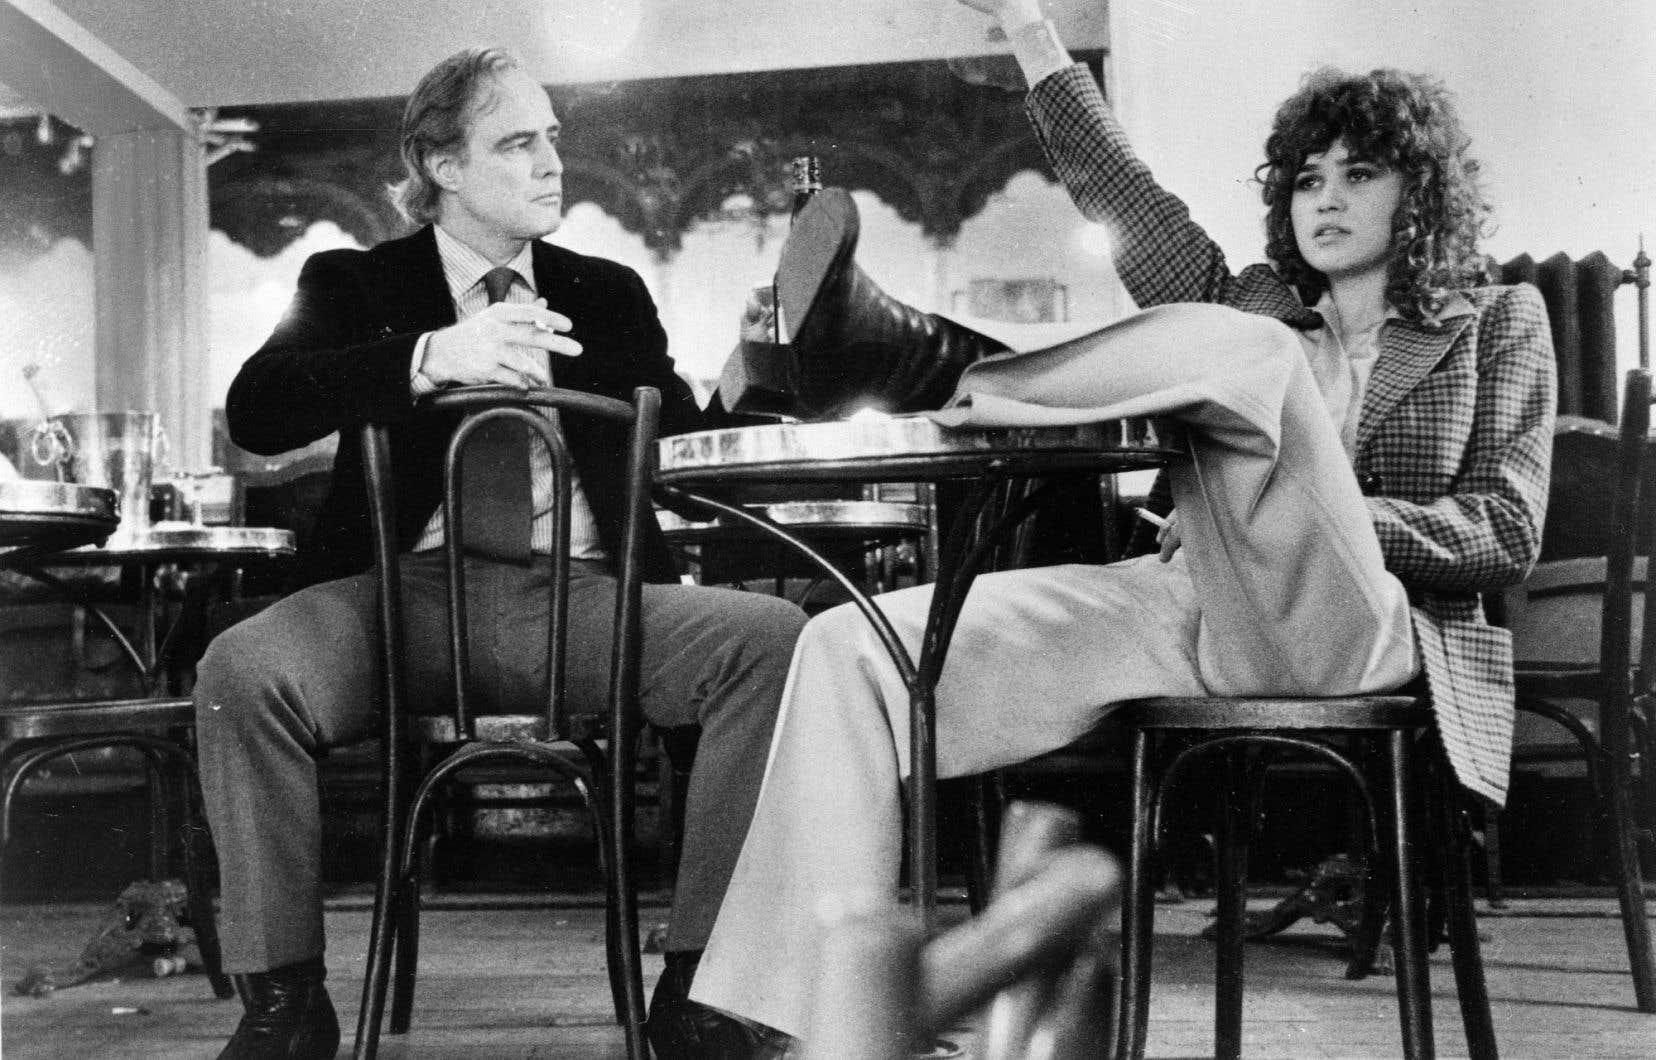 Scène tirée du film «Le dernier tango à Paris» (1972) deBernardo Bertolucci.